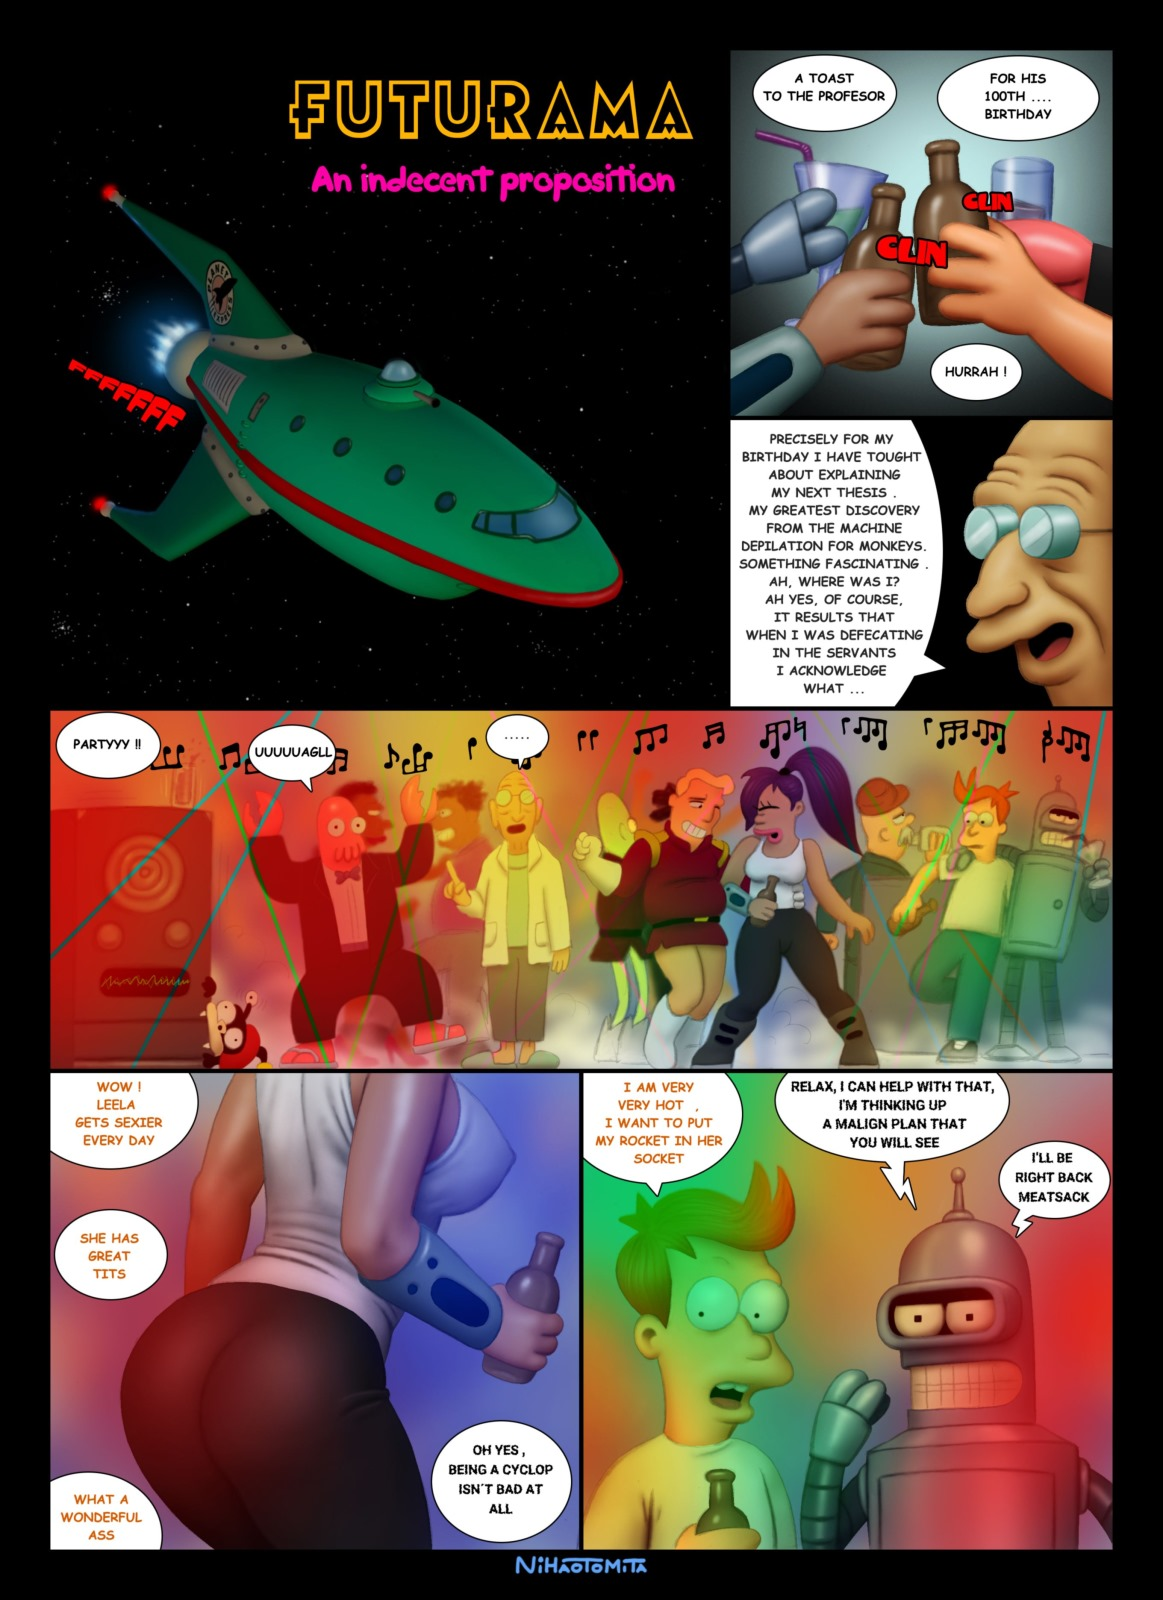 Futurama- An Indecent Proposition image 1